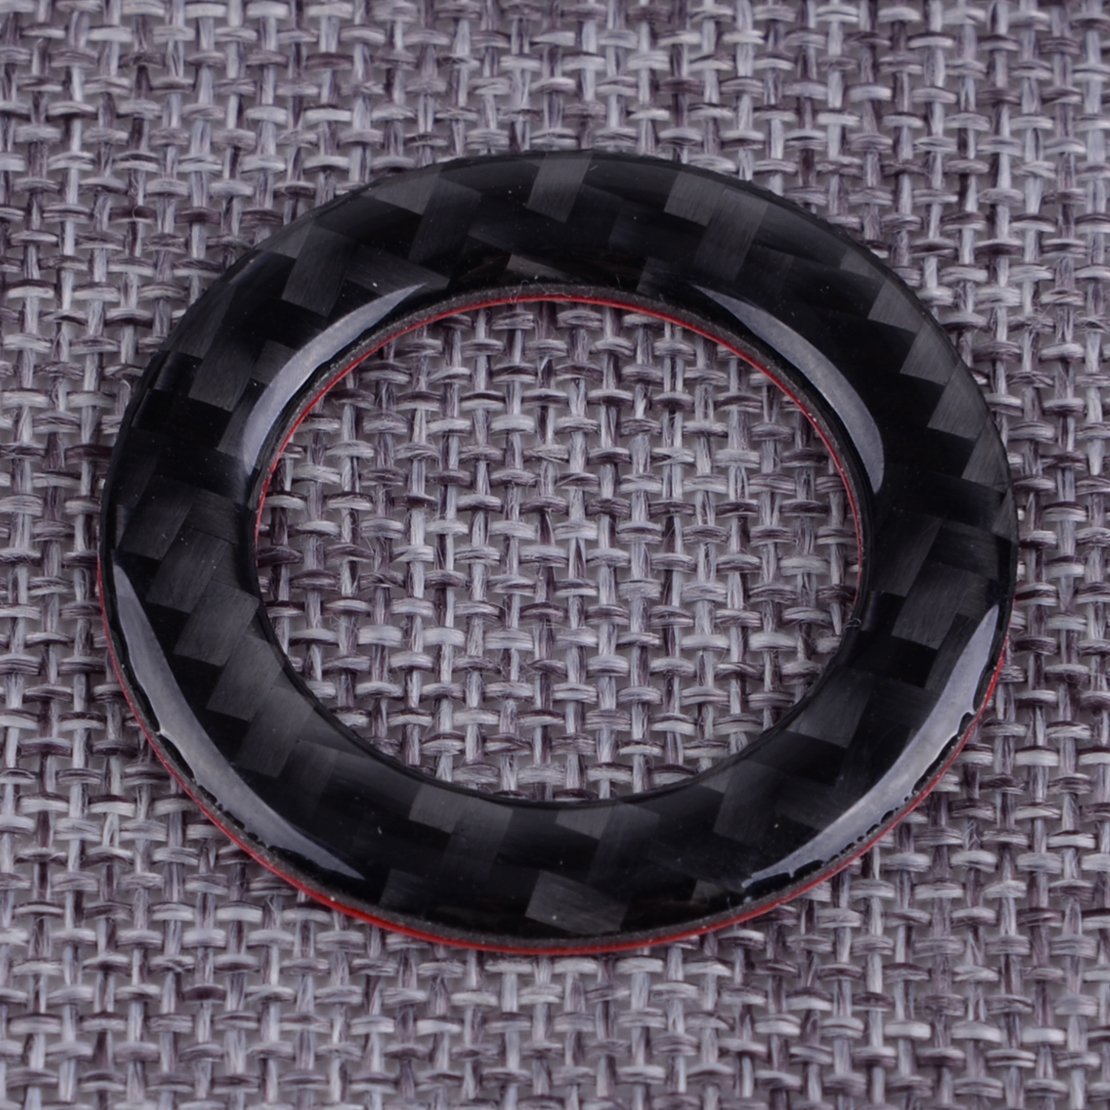 DWCX Carbon Fiber Interior Ignition Push Button Ring Cover  Engine Start Stop Decor Trim Fit For Infiniti Q50 2014-2017 2018